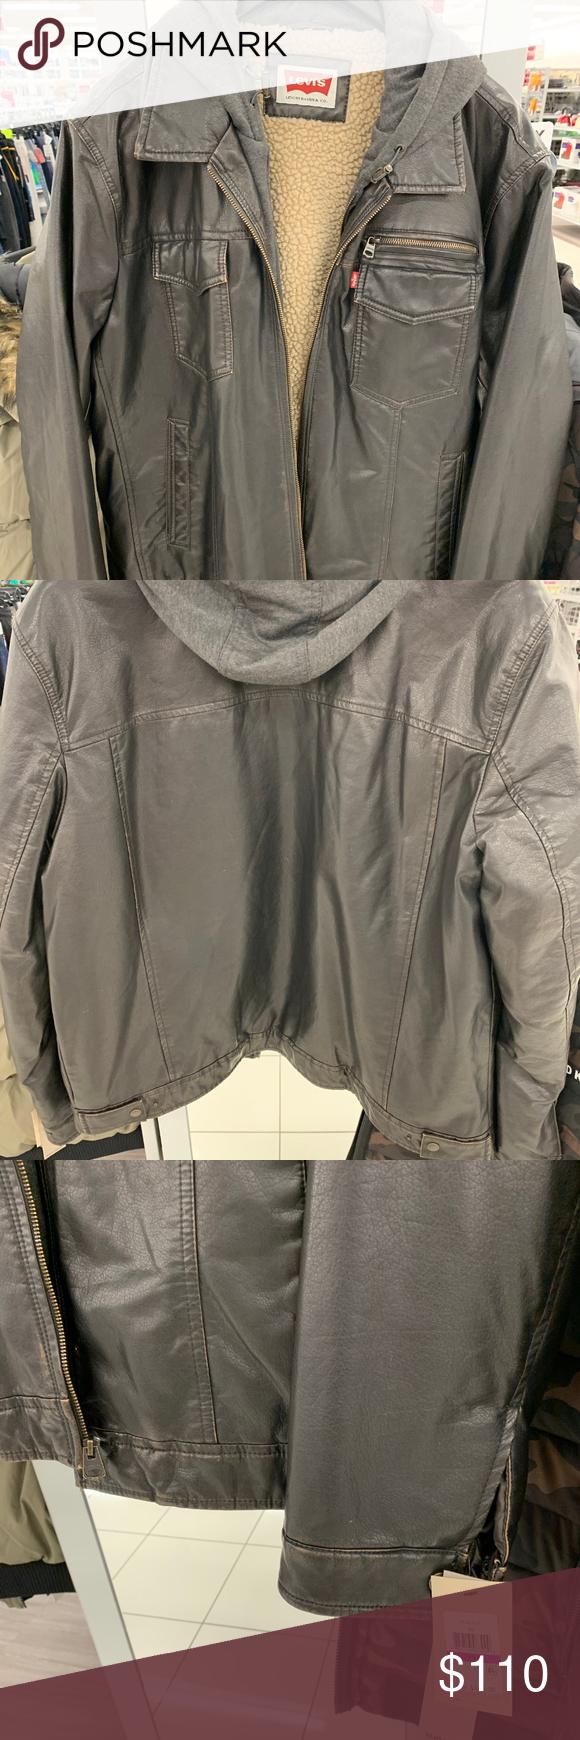 Levi S Hoodie Leather Jacket Leather Jacket Hoodie Jackets Leather Jacket [ 1740 x 580 Pixel ]